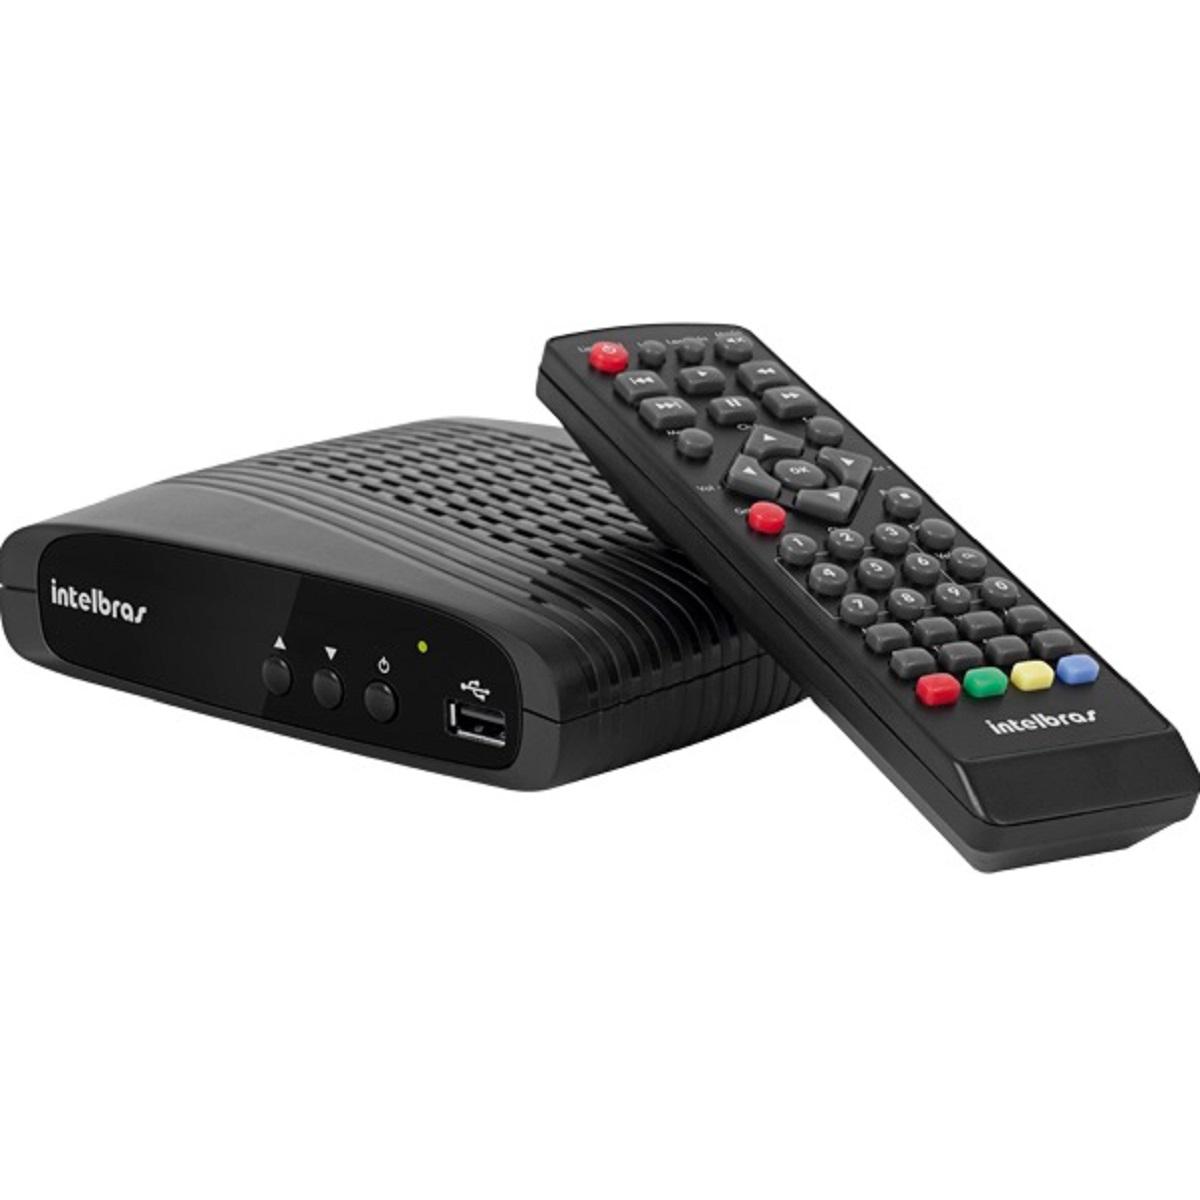 Conversor Digital de TV HD com Gravador de Vídeo Bivolt CD 636 - Reproduz Música, Vídeo e Fotos  - ShopNoroeste.com.br